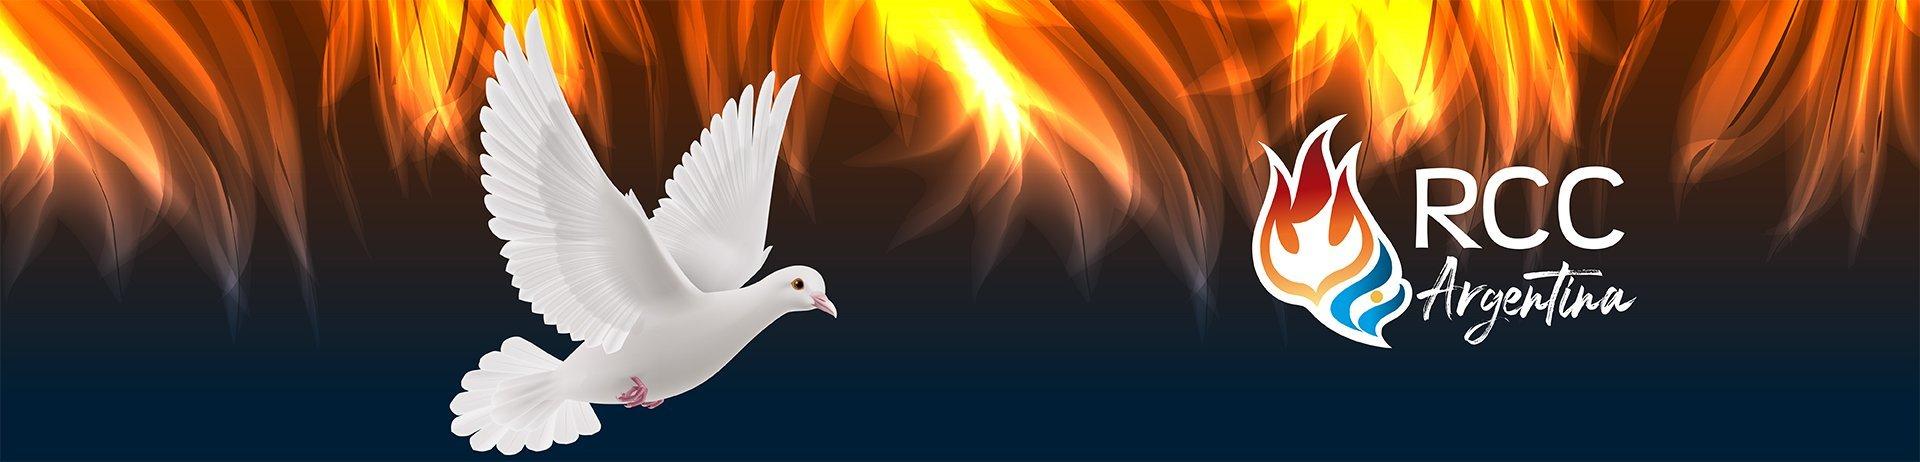 071 – La Experiencia de Pentecostés